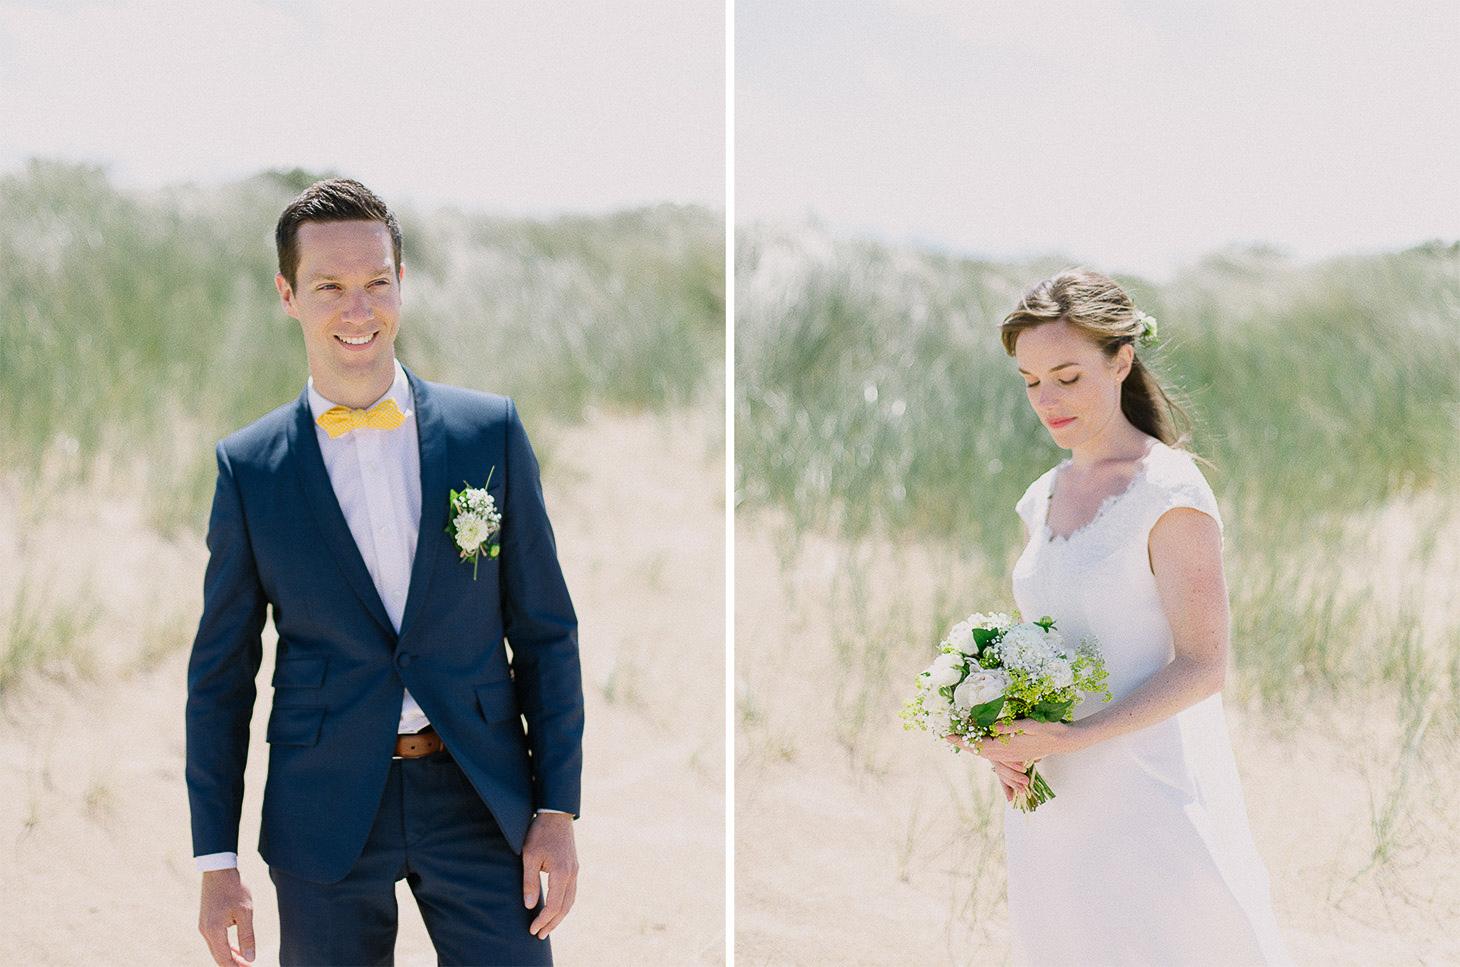 photographe-mariage-champ-de-launay-normandie-00026